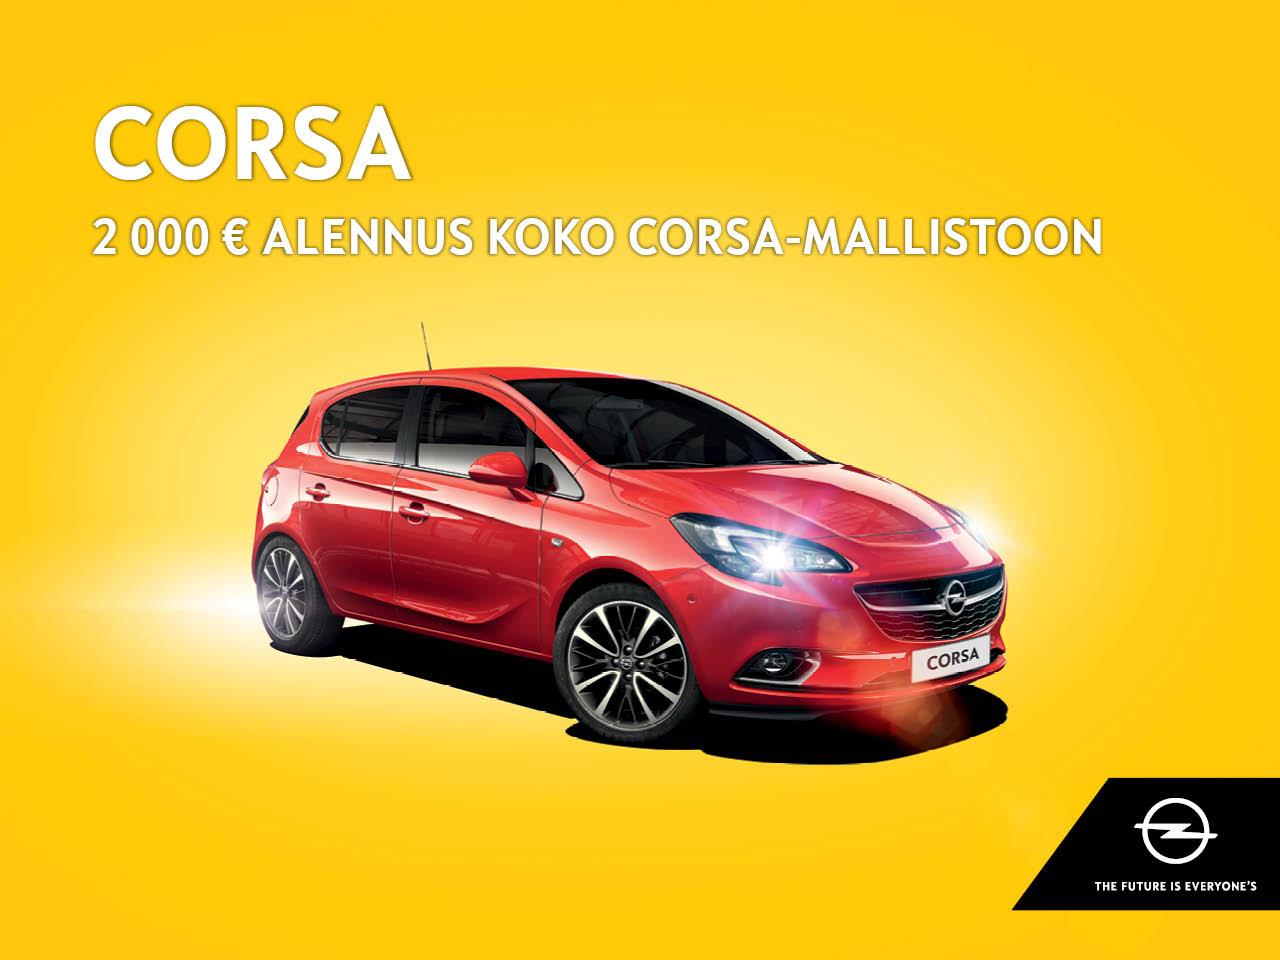 Opel Kauppalauantai 13.4. Lielahdessa!